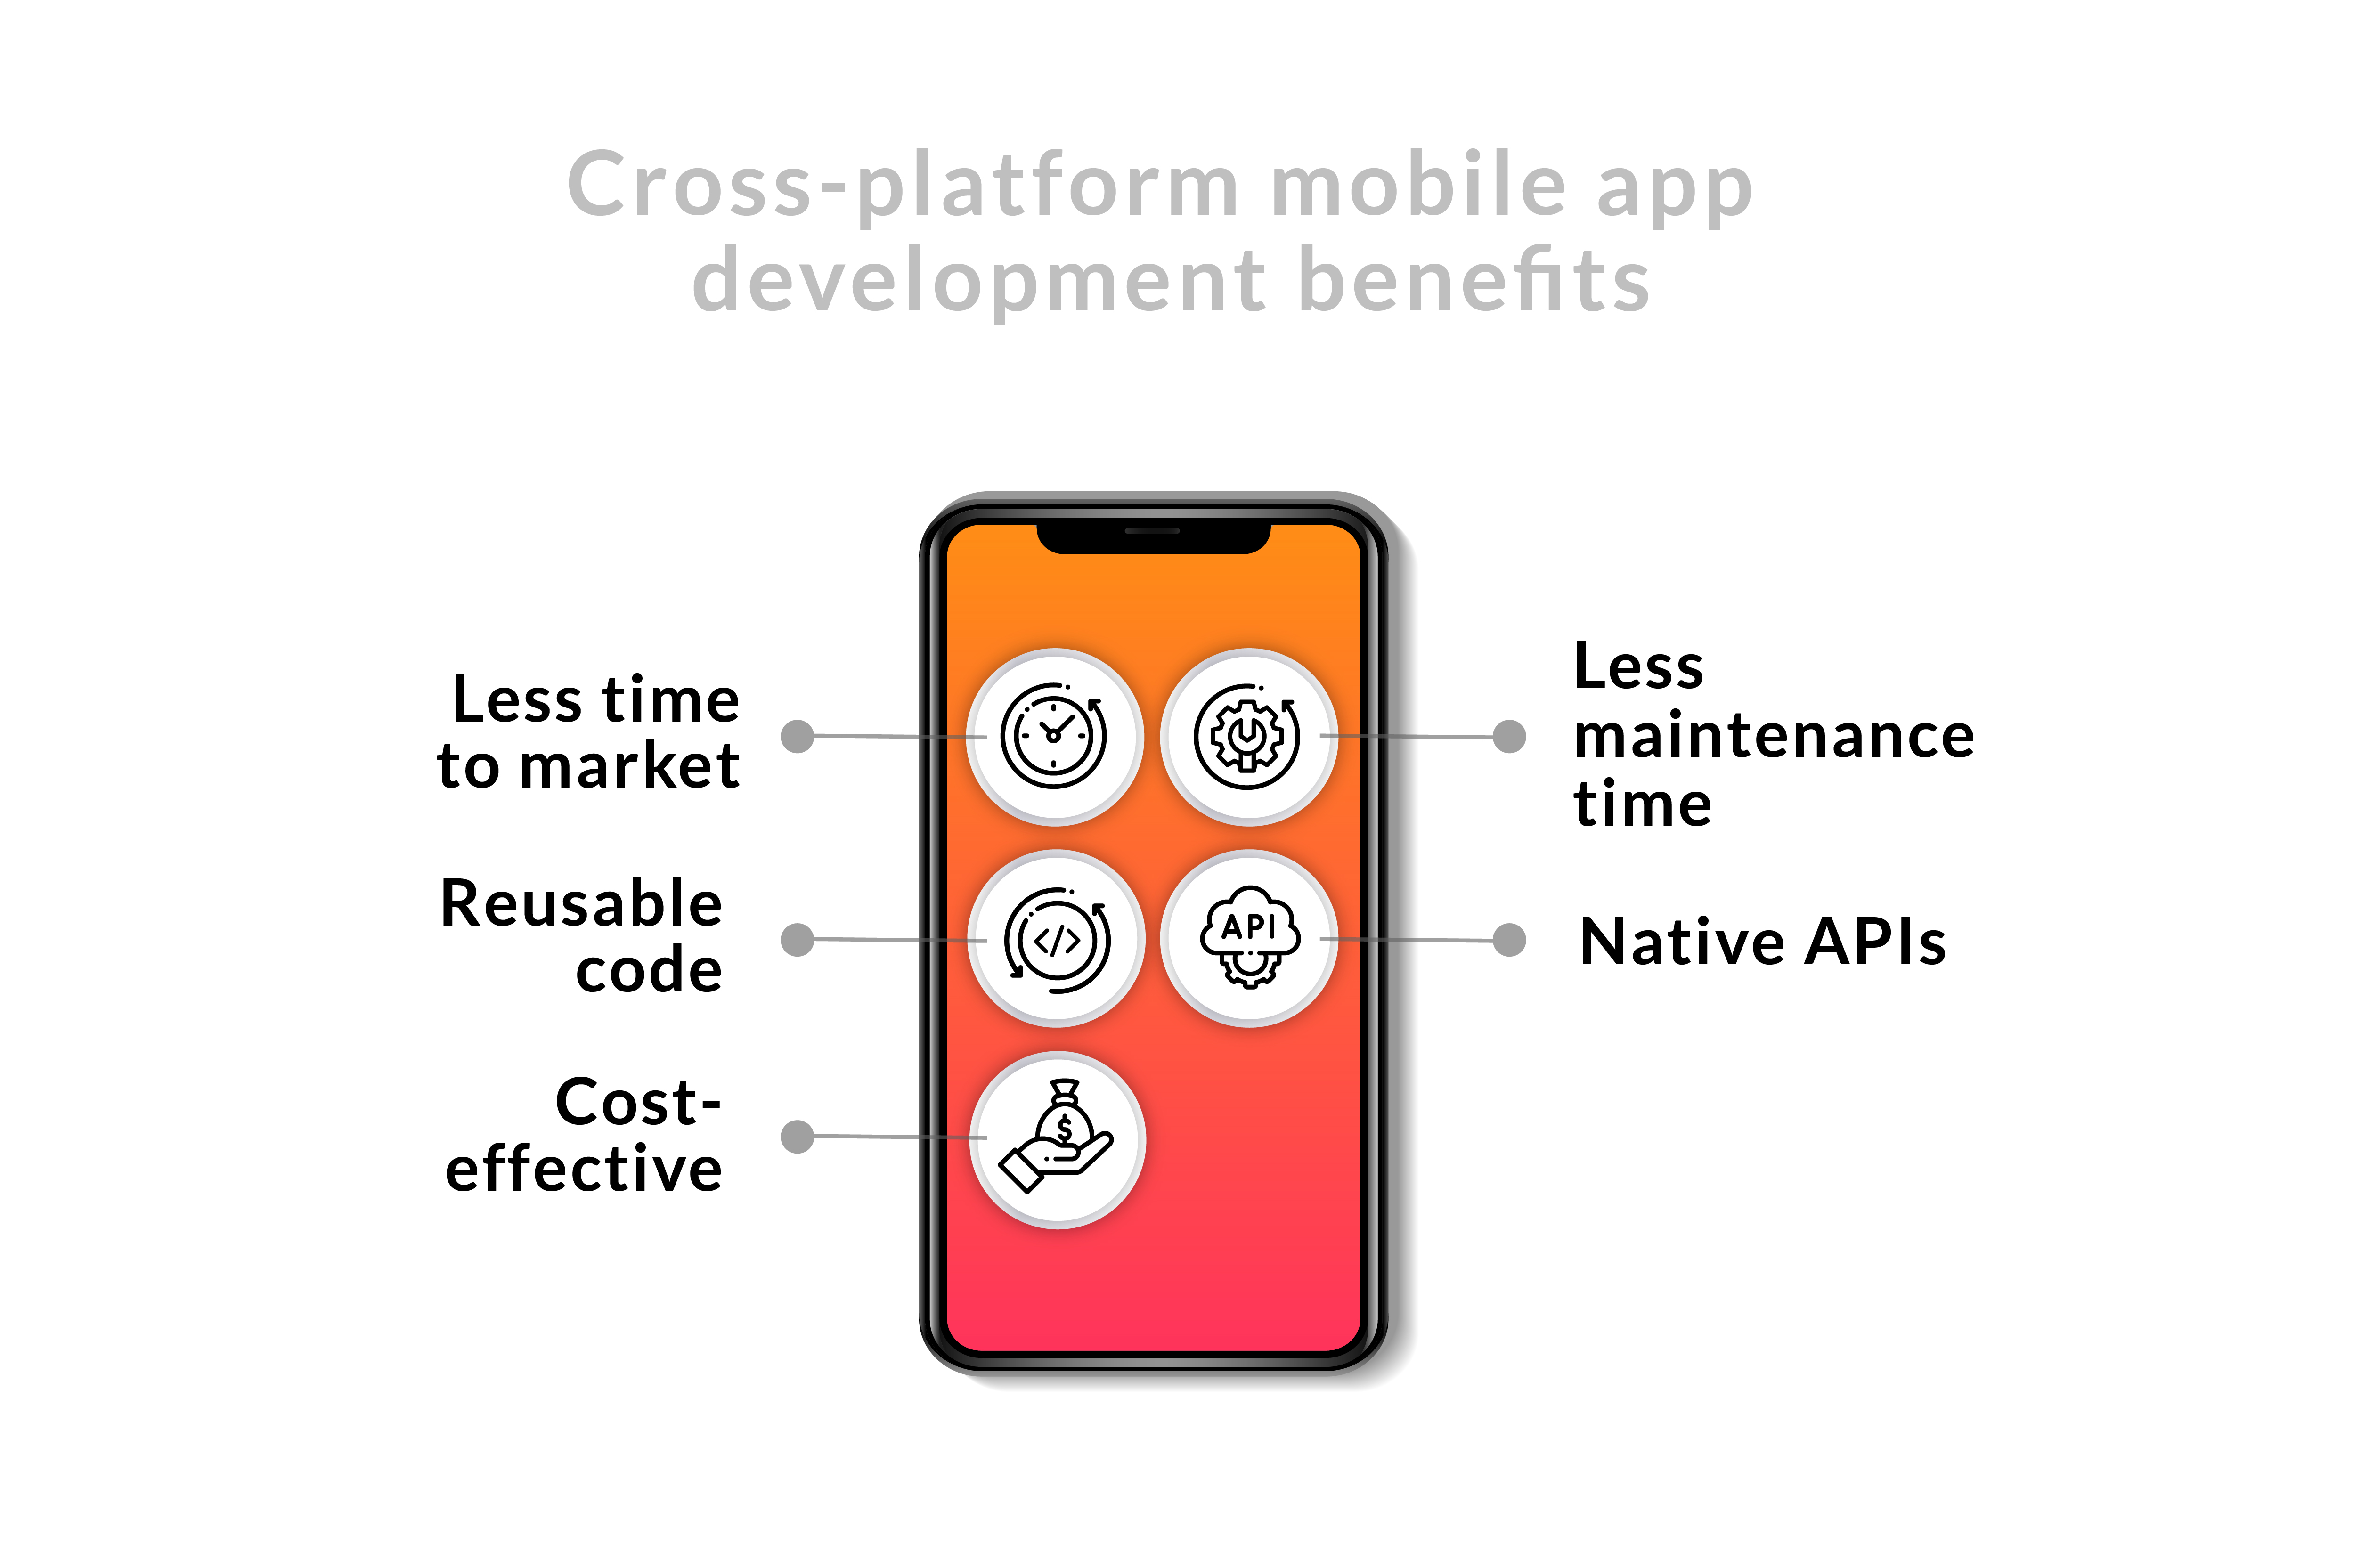 Cross-platform mobile app development benefits